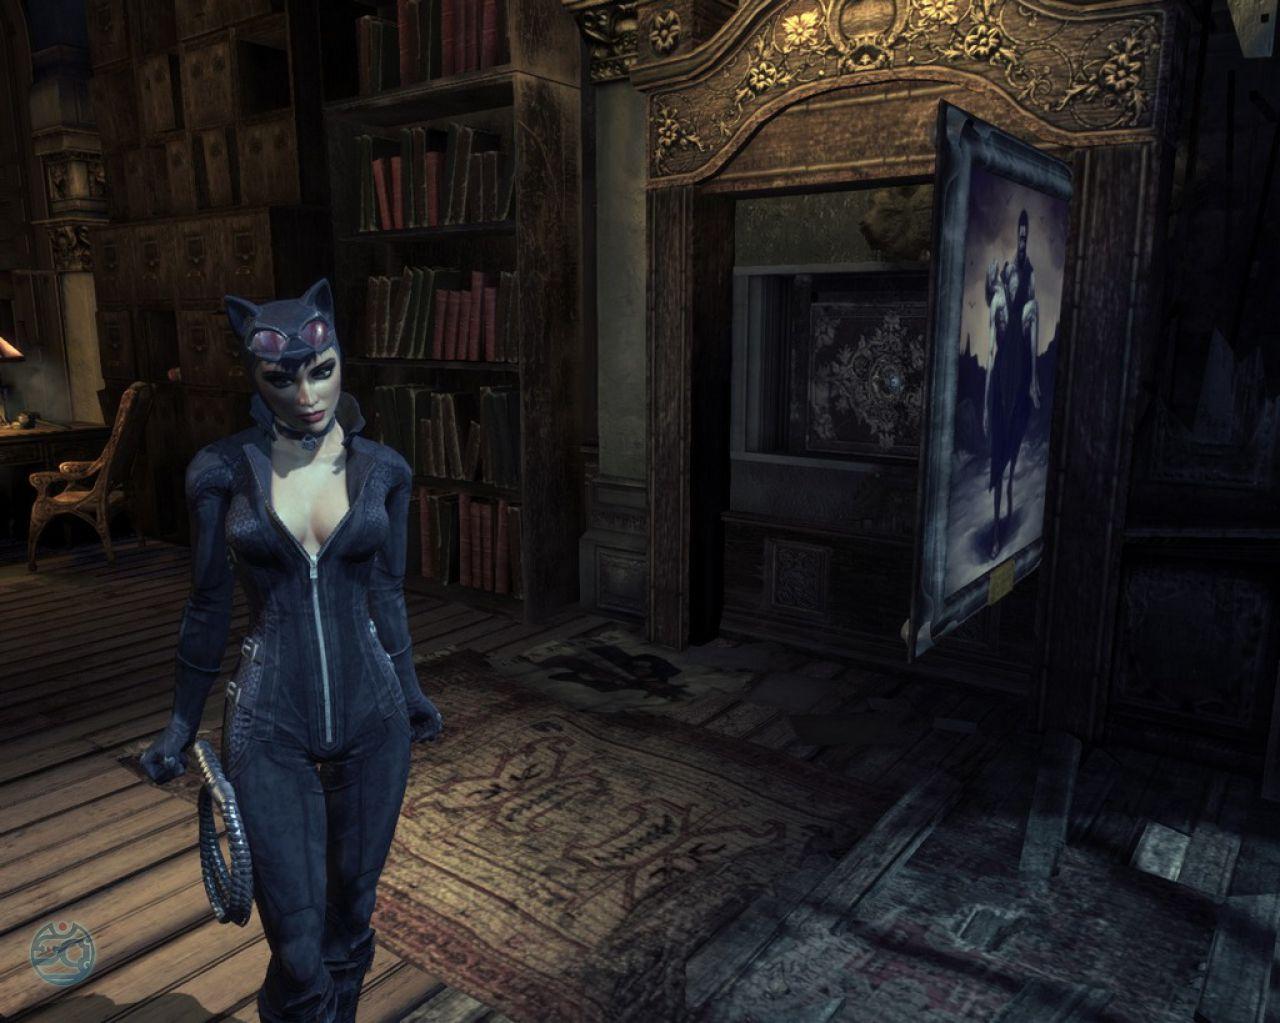 Arkham city cat woman mod erotic movie